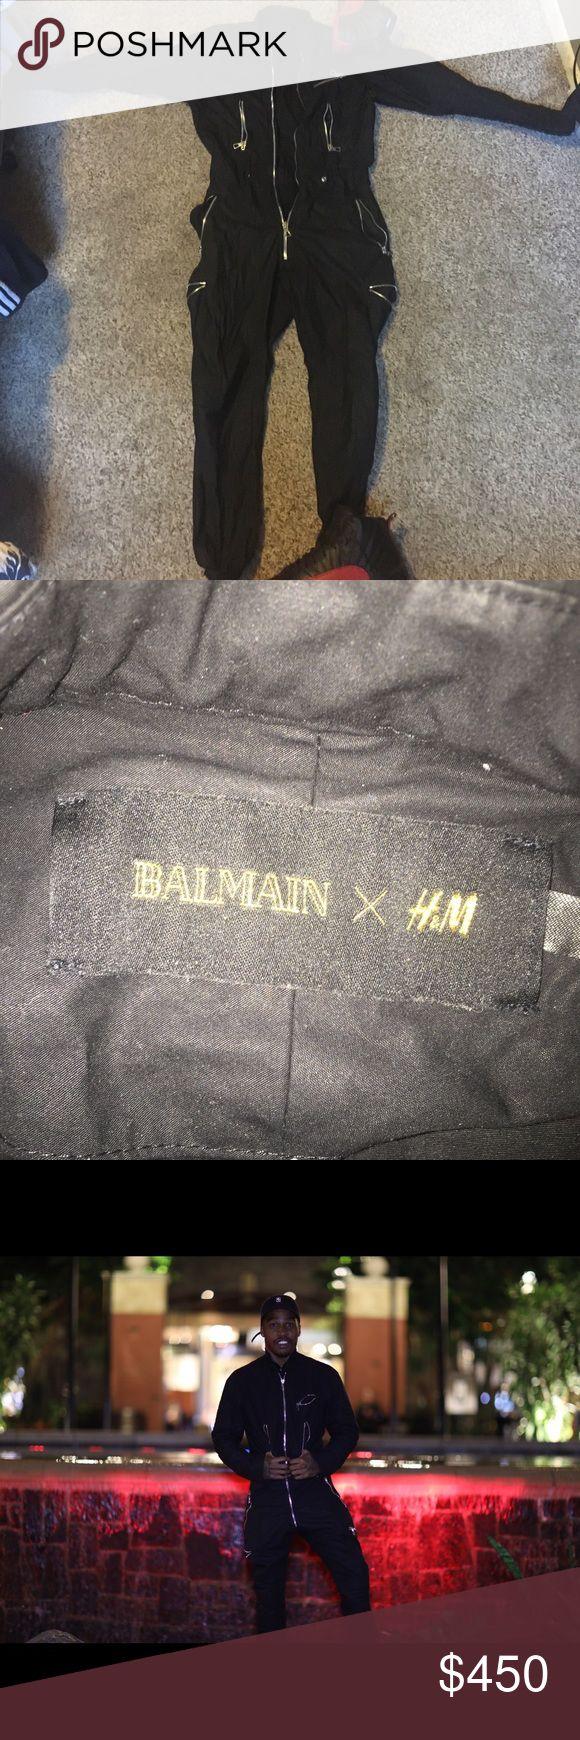 Balmain x H&M Jumper Balmain Pants Jumpsuits & Rompers